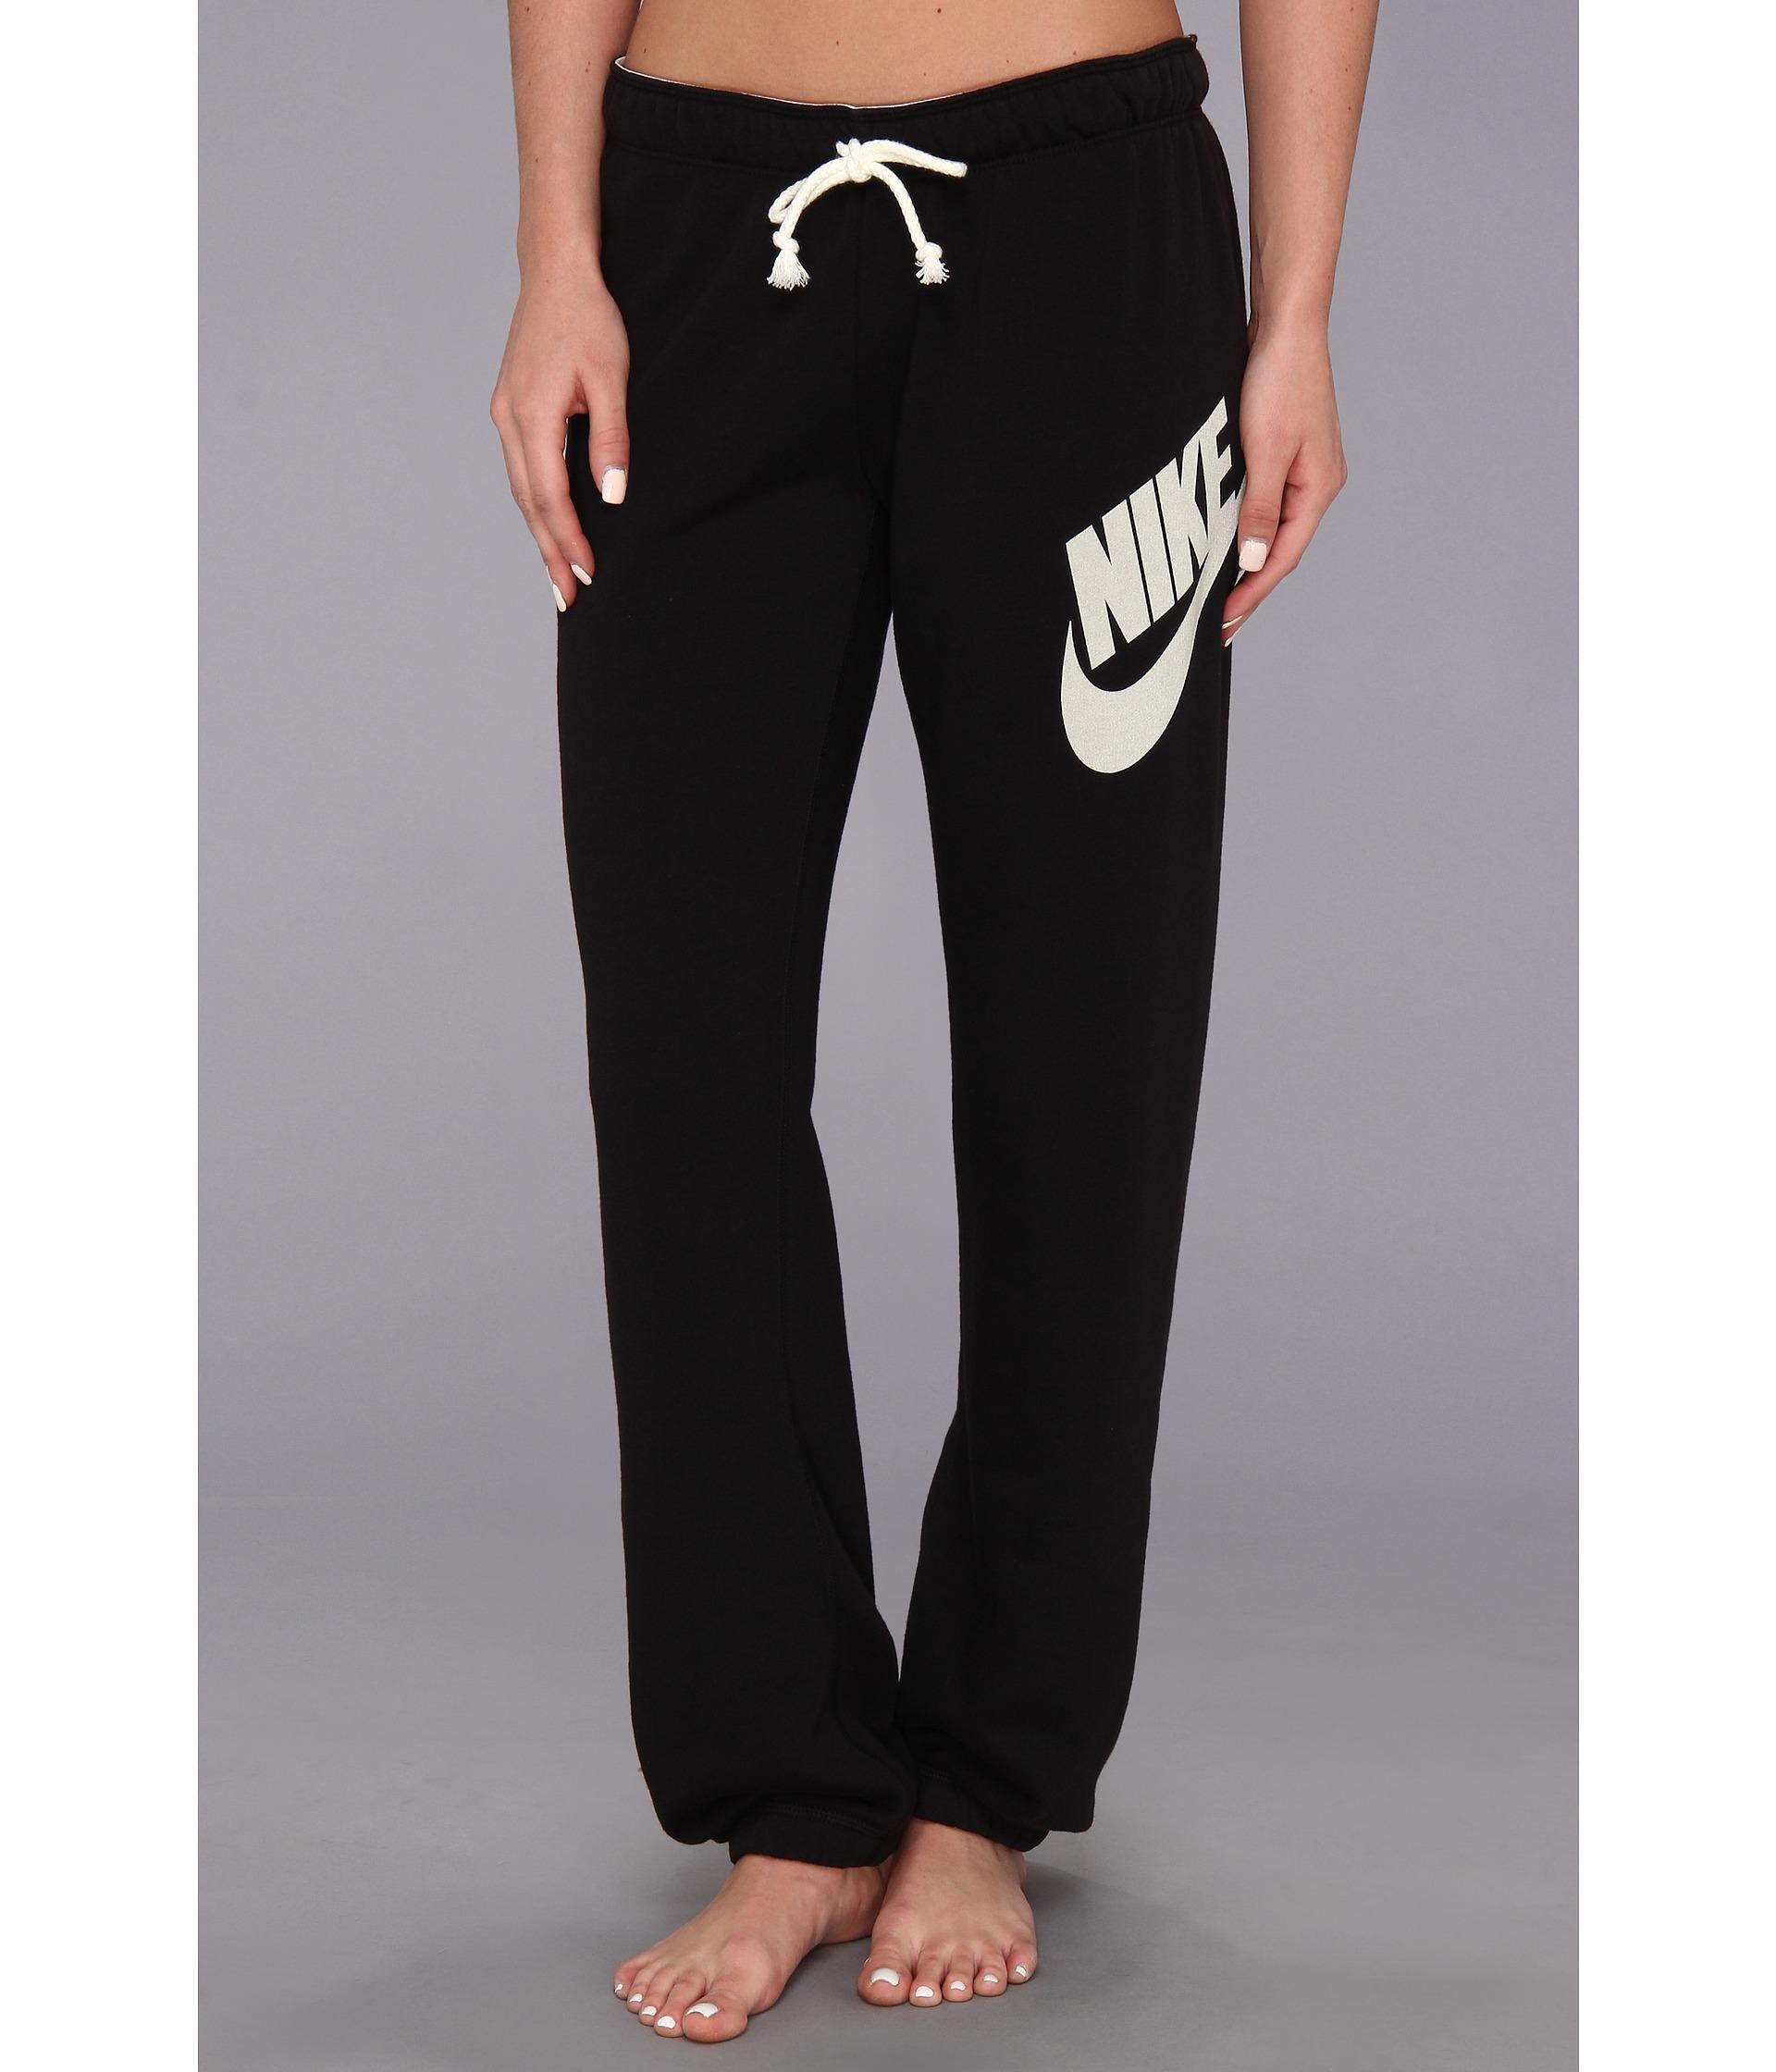 Wonderful Nike Pants White Black Club French Terry Lounge And Women39S Nike Pants